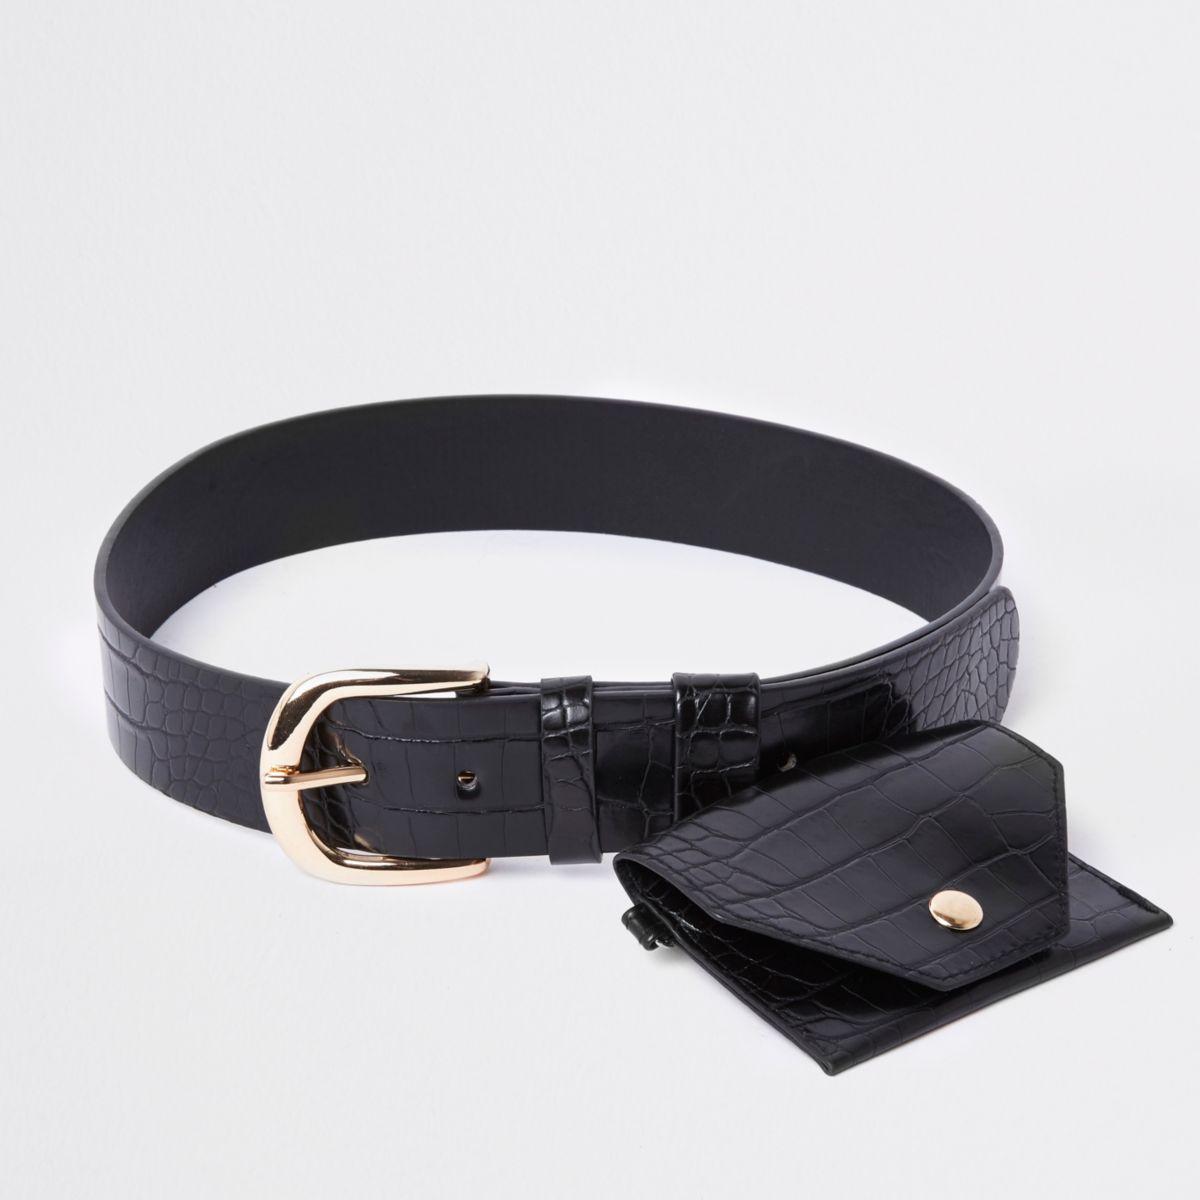 Zwarte riem met portemonnee en krokodillenprint